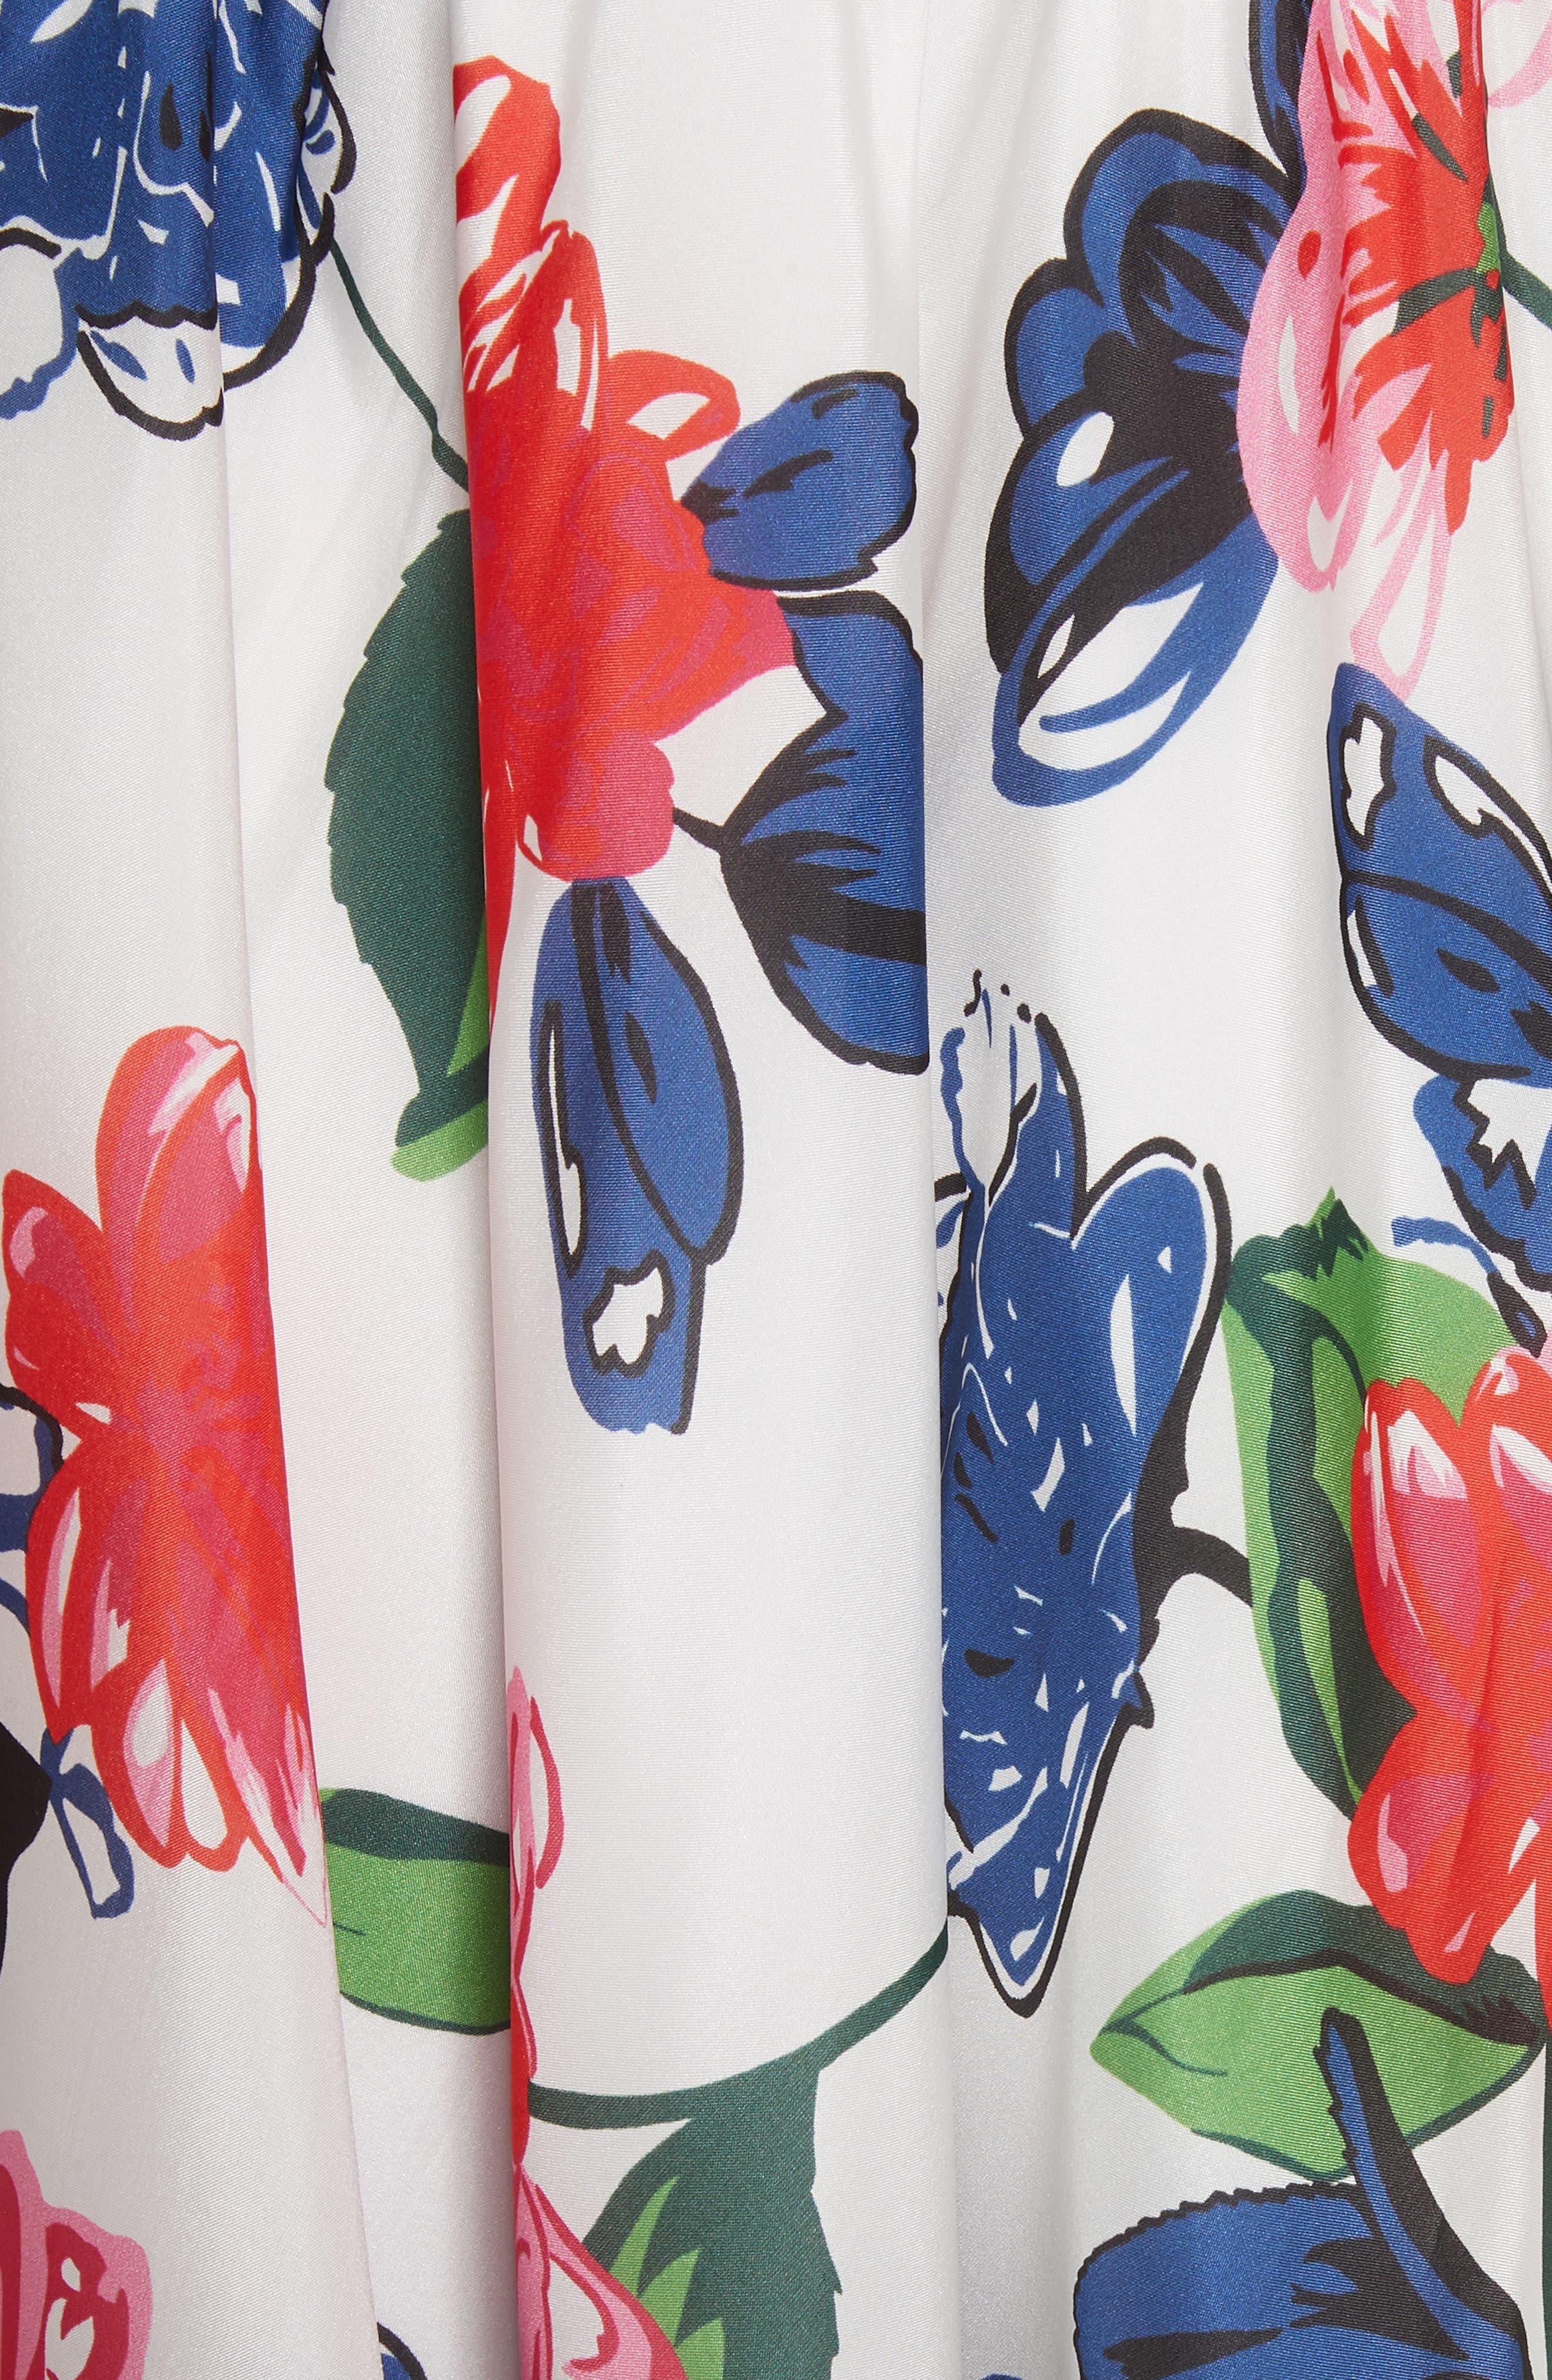 Floral Print Double Keyhole Silk Dress,                             Alternate thumbnail 5, color,                             MULTI